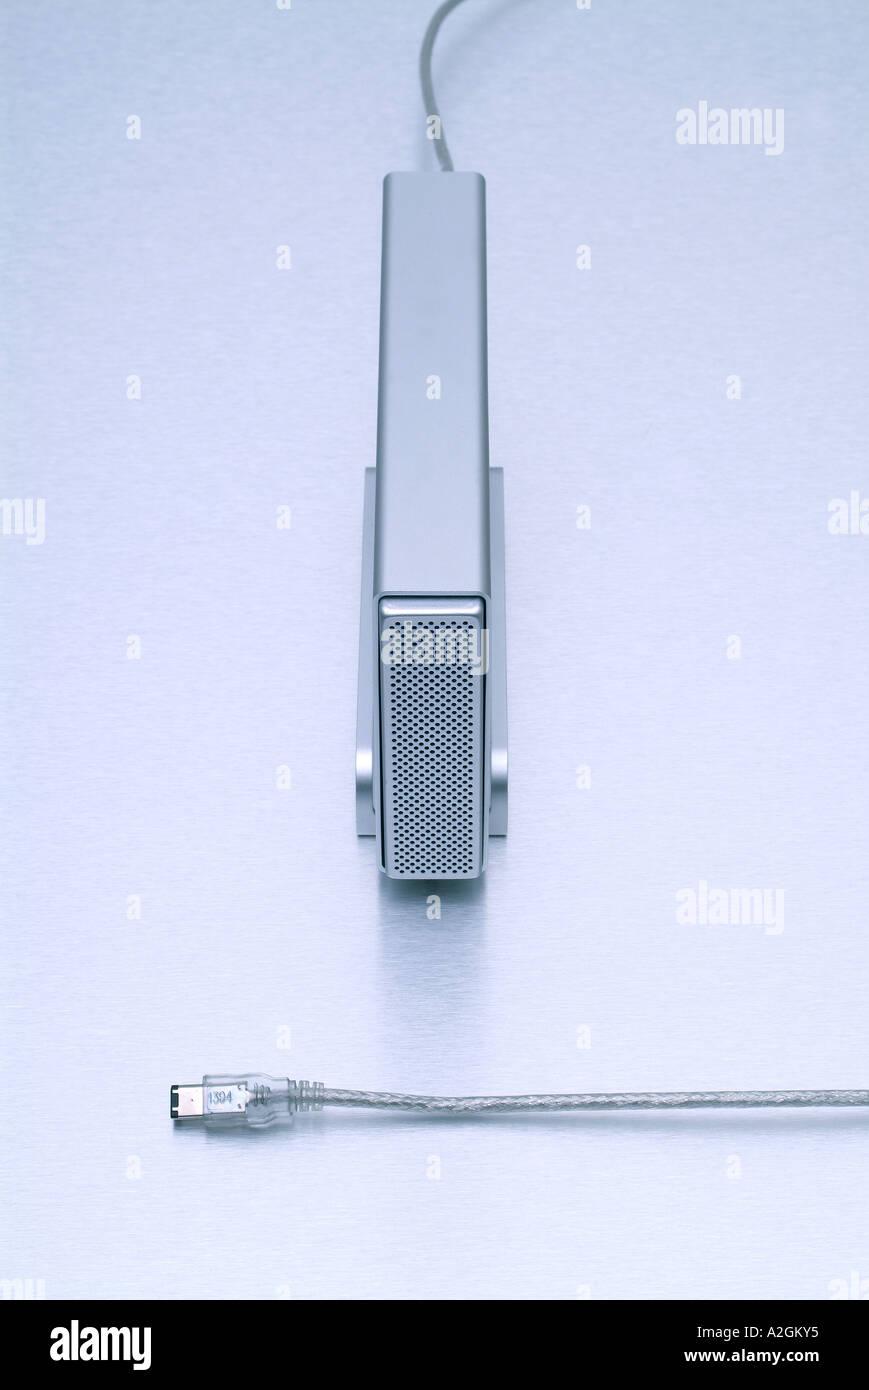 External Firewire Harddisk externe Firewire Festplatte - Stock Image